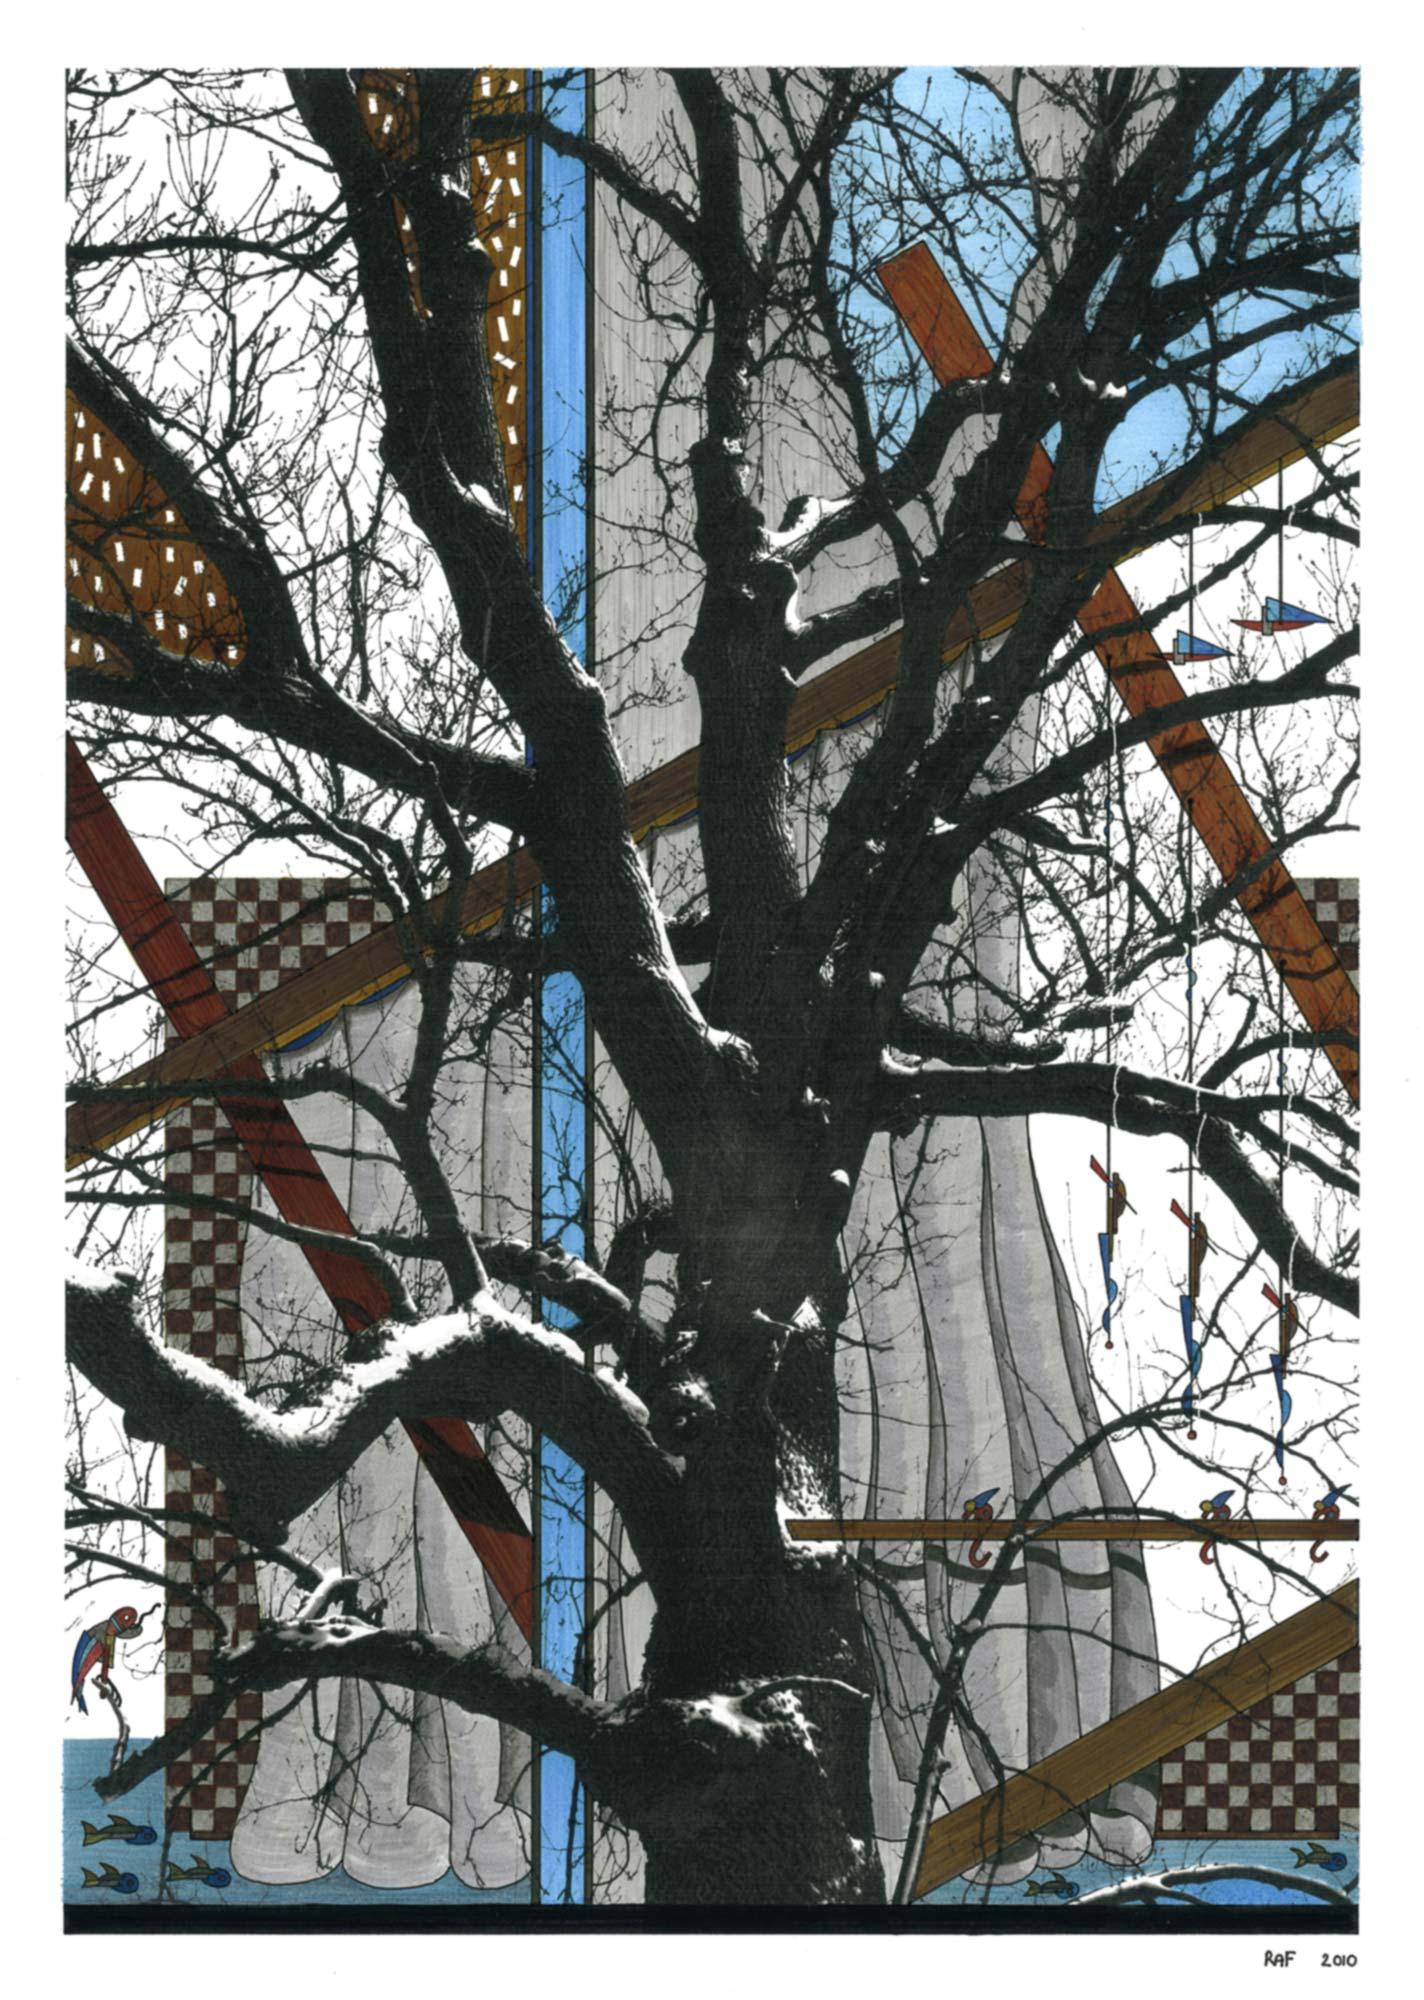 L'arbre caché, dessin, Raf Listowski, 2010